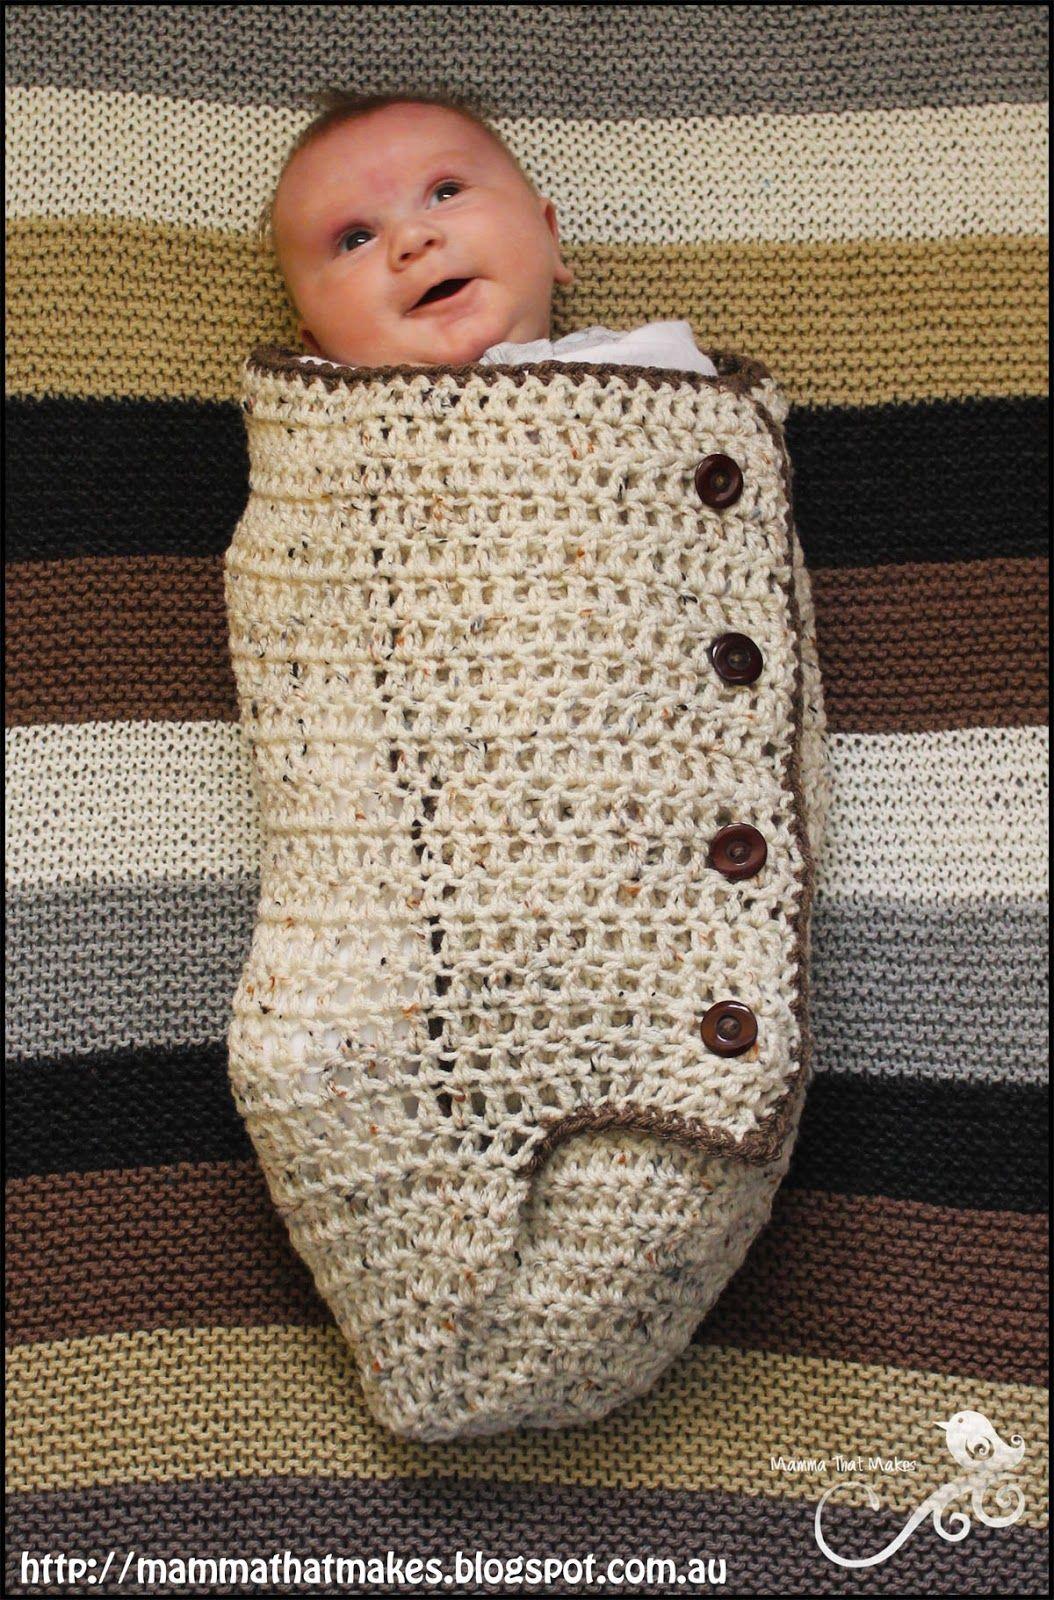 Mamma That Makes: Snuggle Cuddle Cocoon Resized - Free Newborn Croch ...